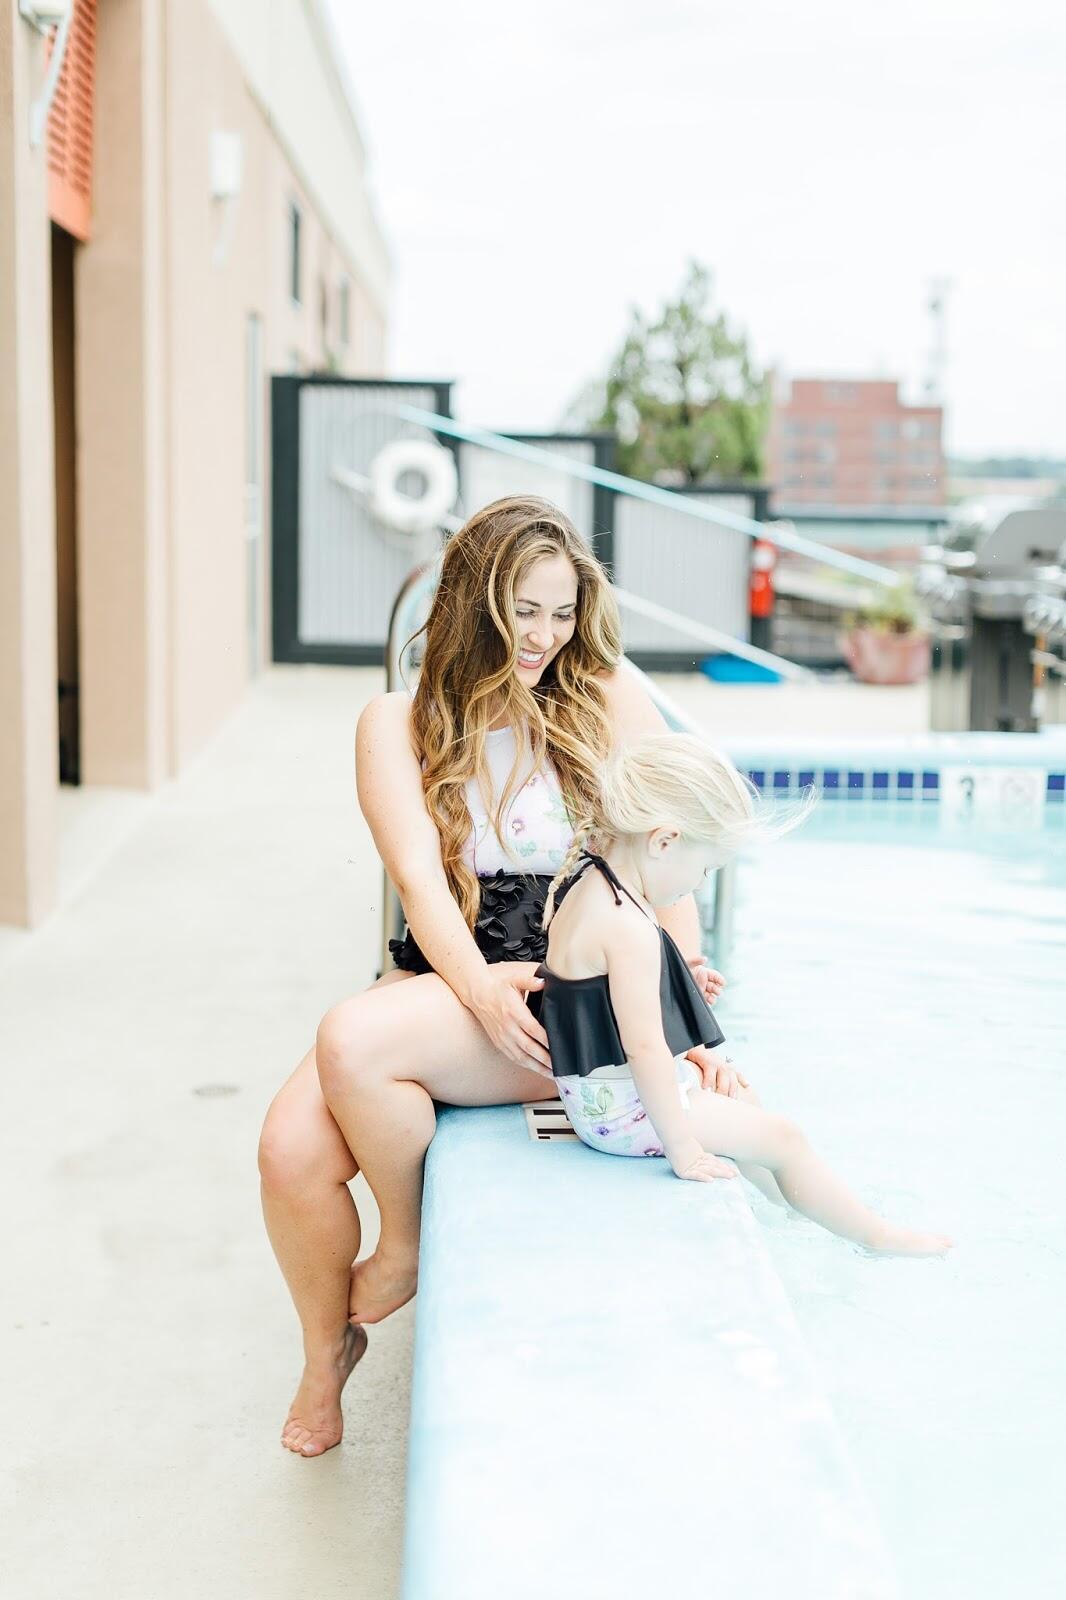 Trend Spin Linkup - Kortni Jeans Swimwear Giveaway by fashion blogger Laura of Walking in Memphis in High Heels